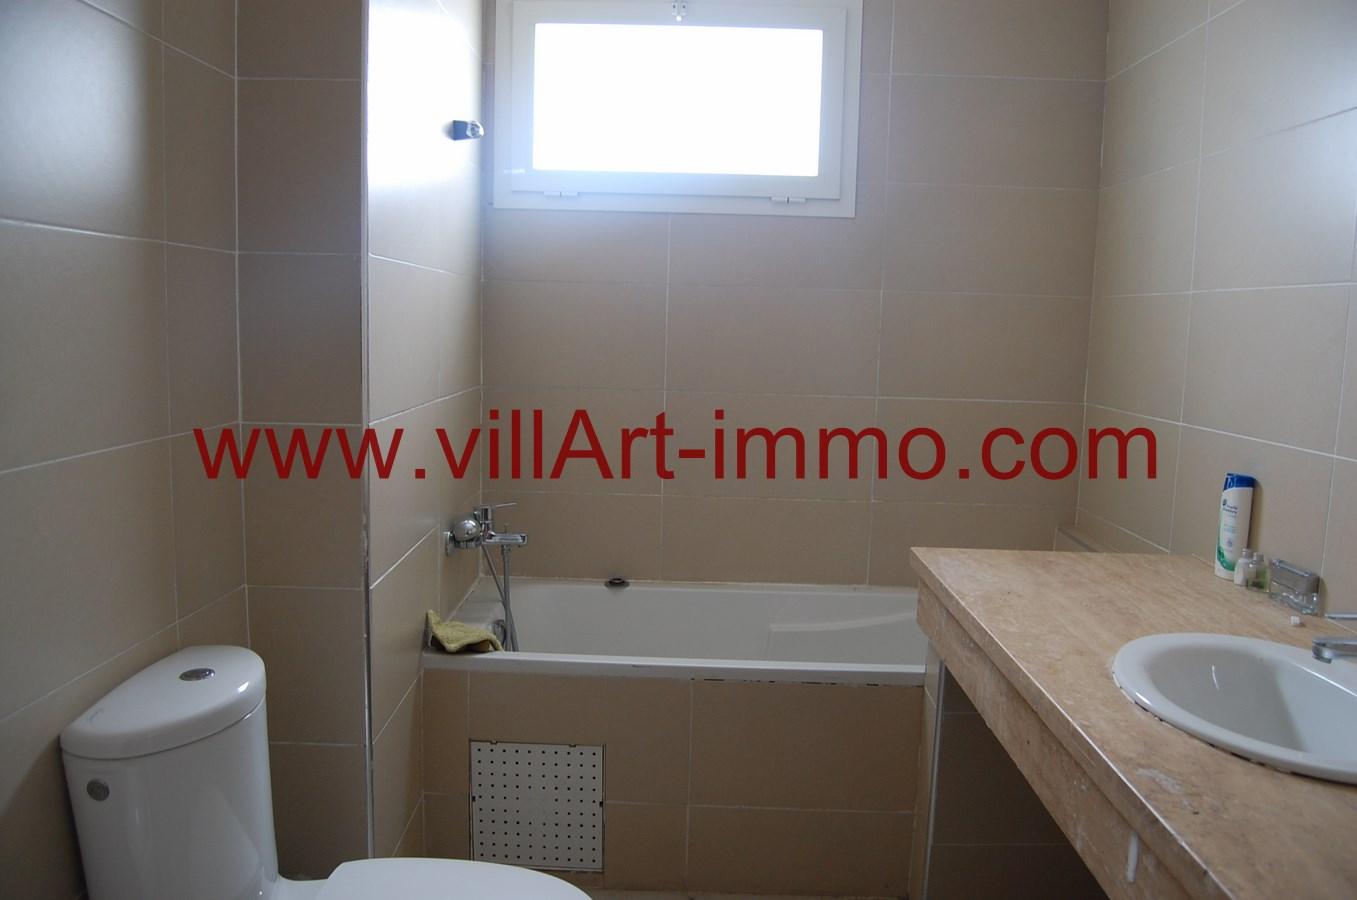 11-a-louer-appartement-non-meuble-tanger-salle-de-bain-2-l889-villart-immo